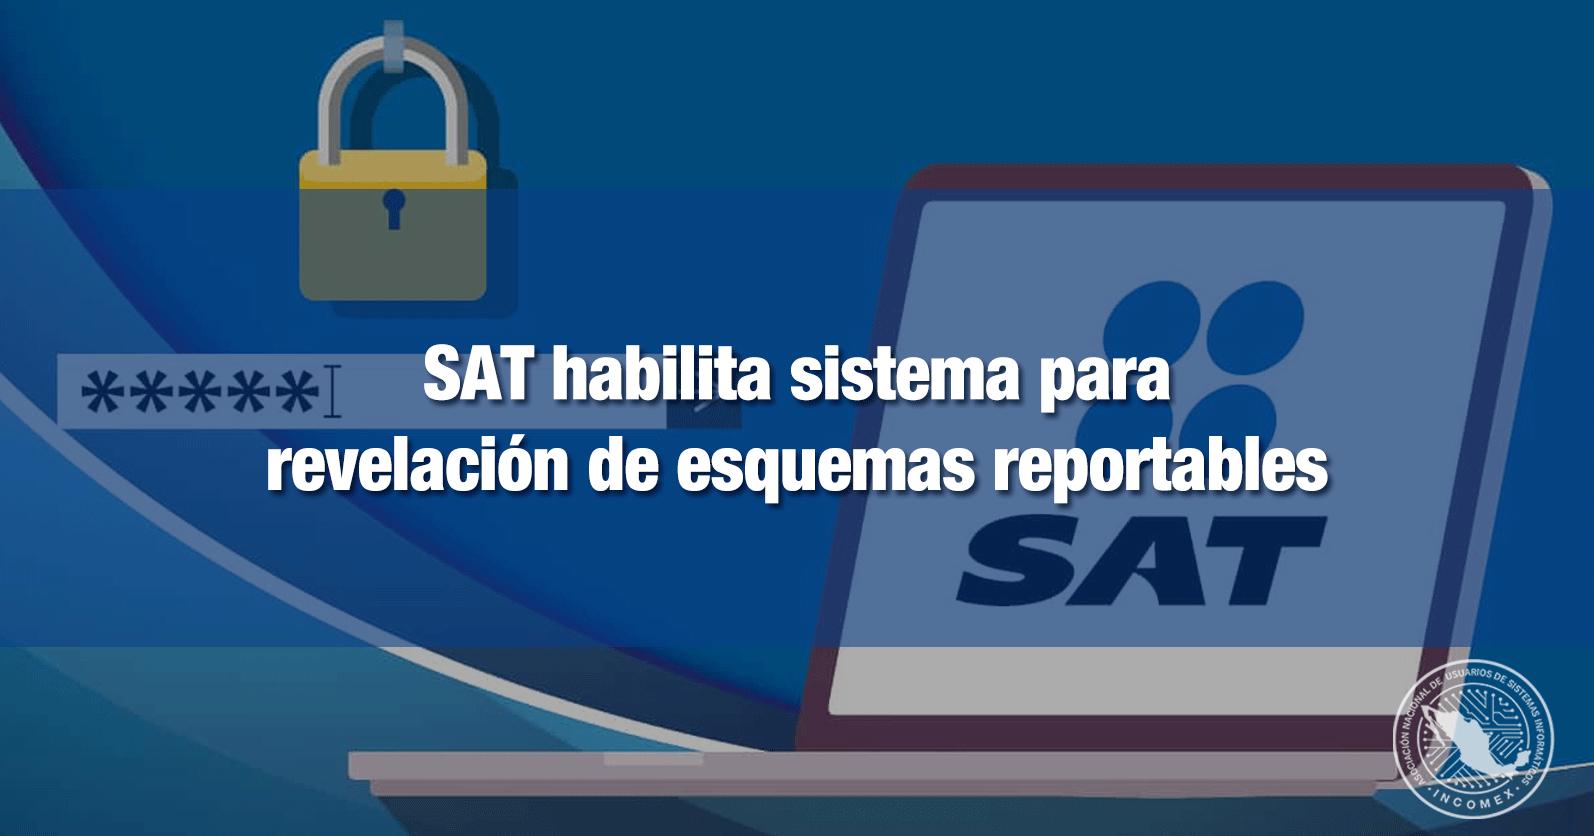 SAT habilita sistema para revelación de esquemas reportables